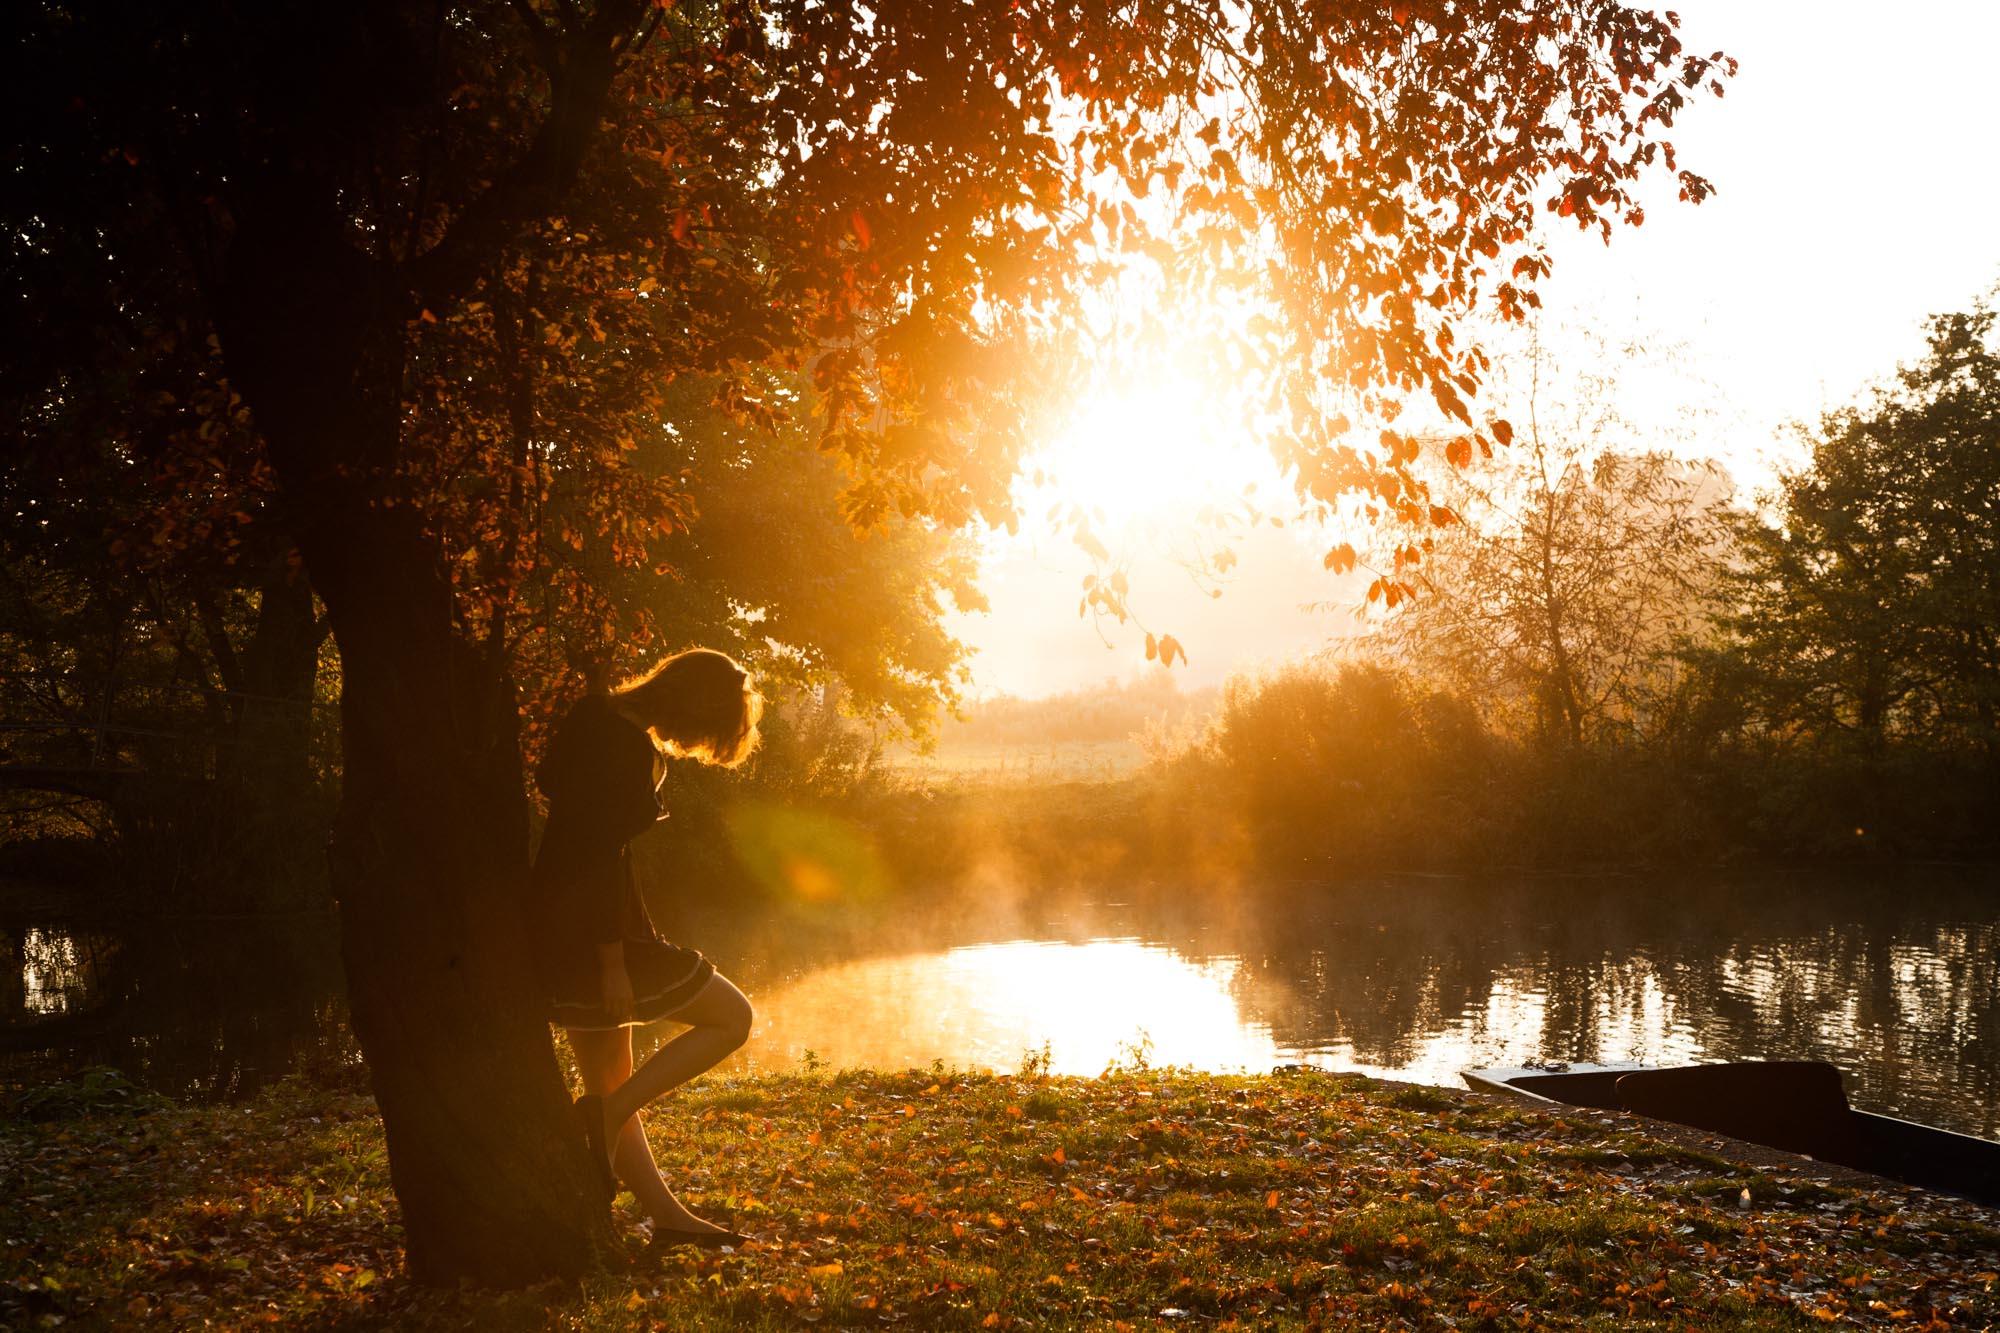 portraits-photographer-oxford-london-jonathan-self-photography_-8.jpg